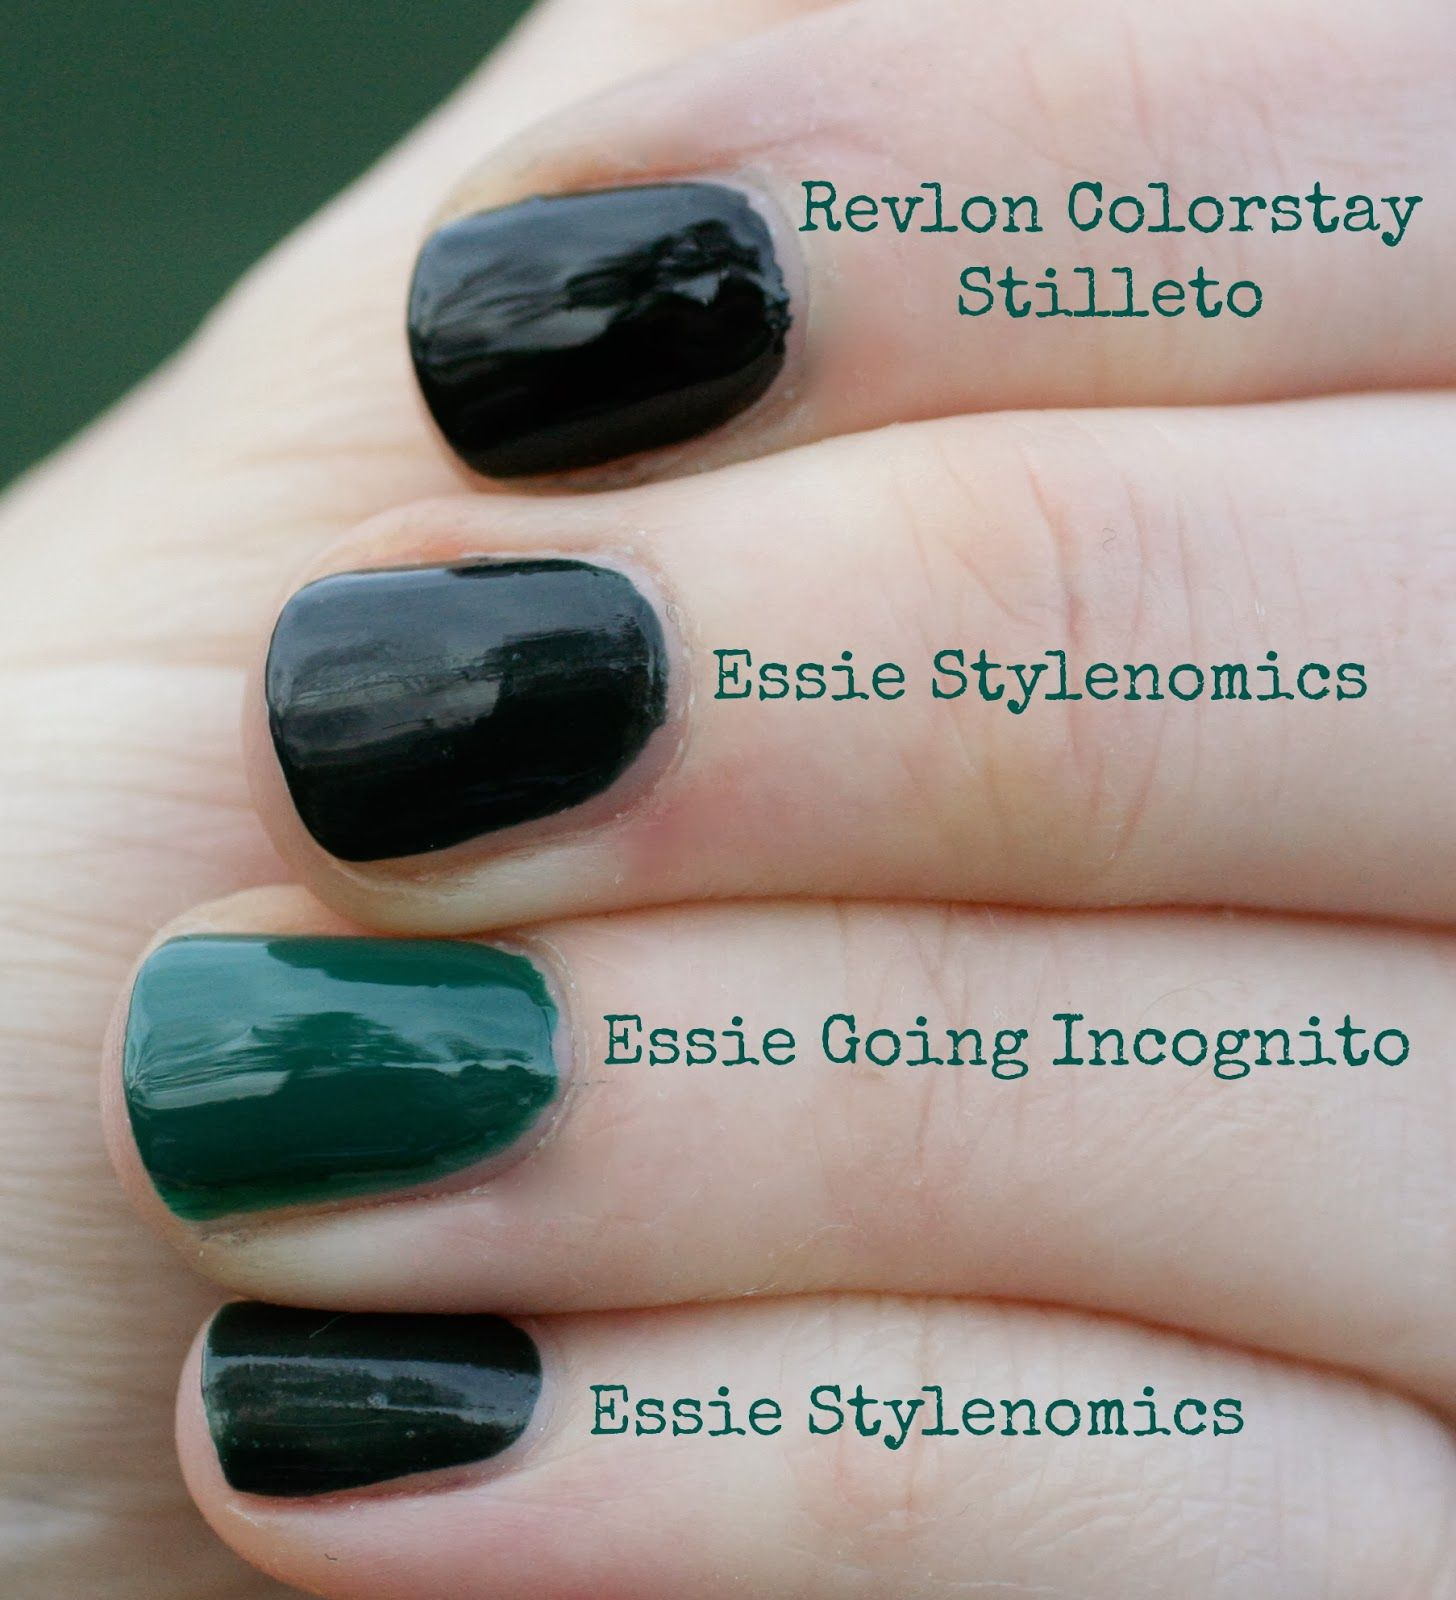 Comparison of Essie Stylenomics next to black and next to emerald ...